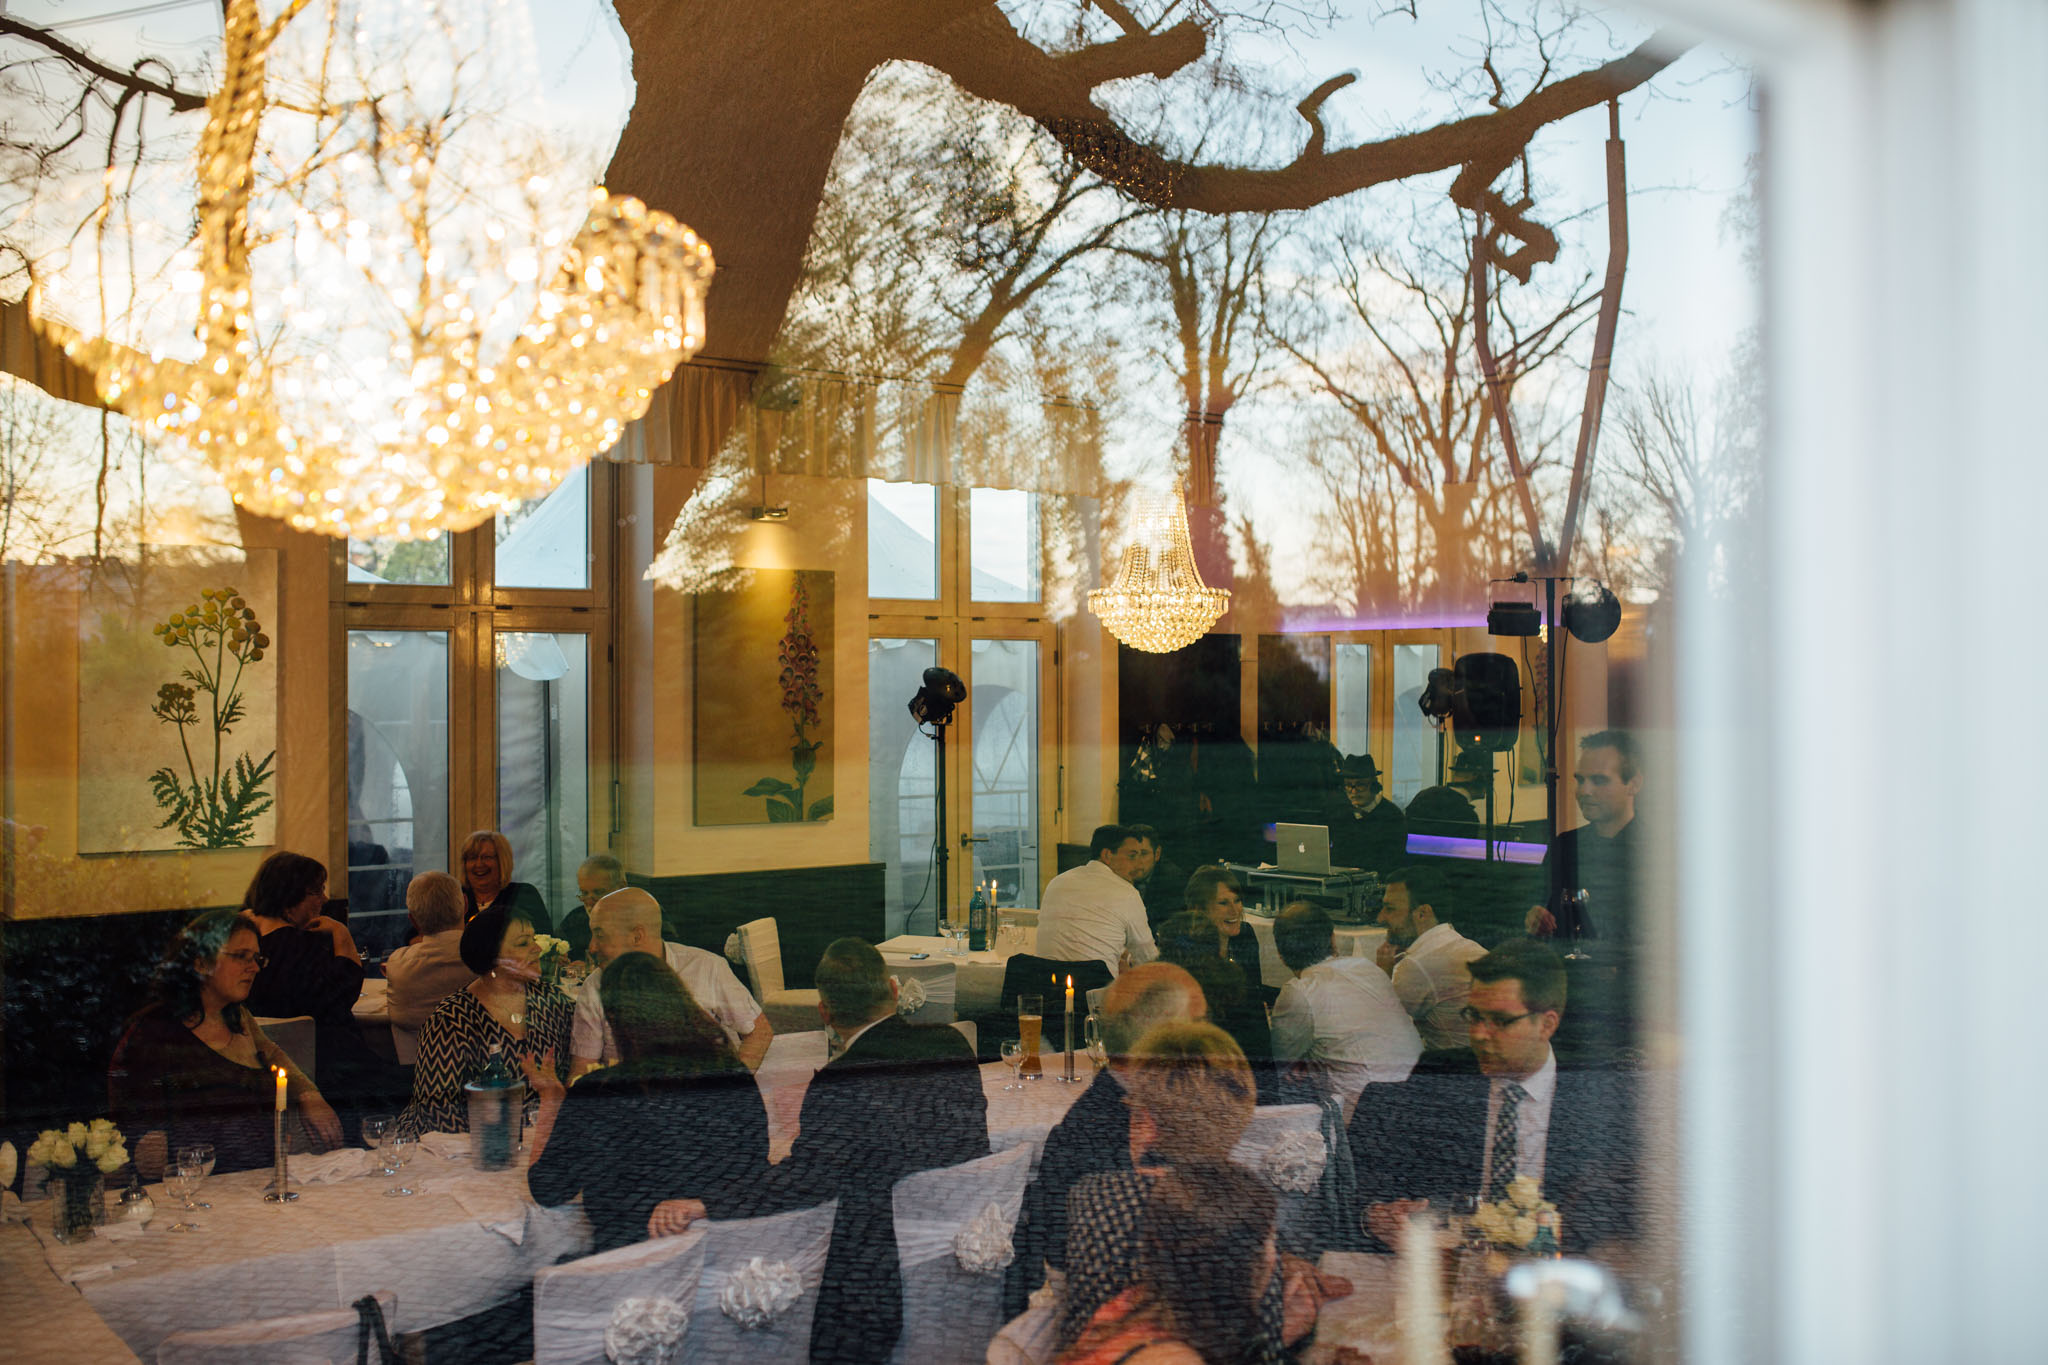 hochzeit-feiern-schlosscafe-hochzeitsfotograf-berlin